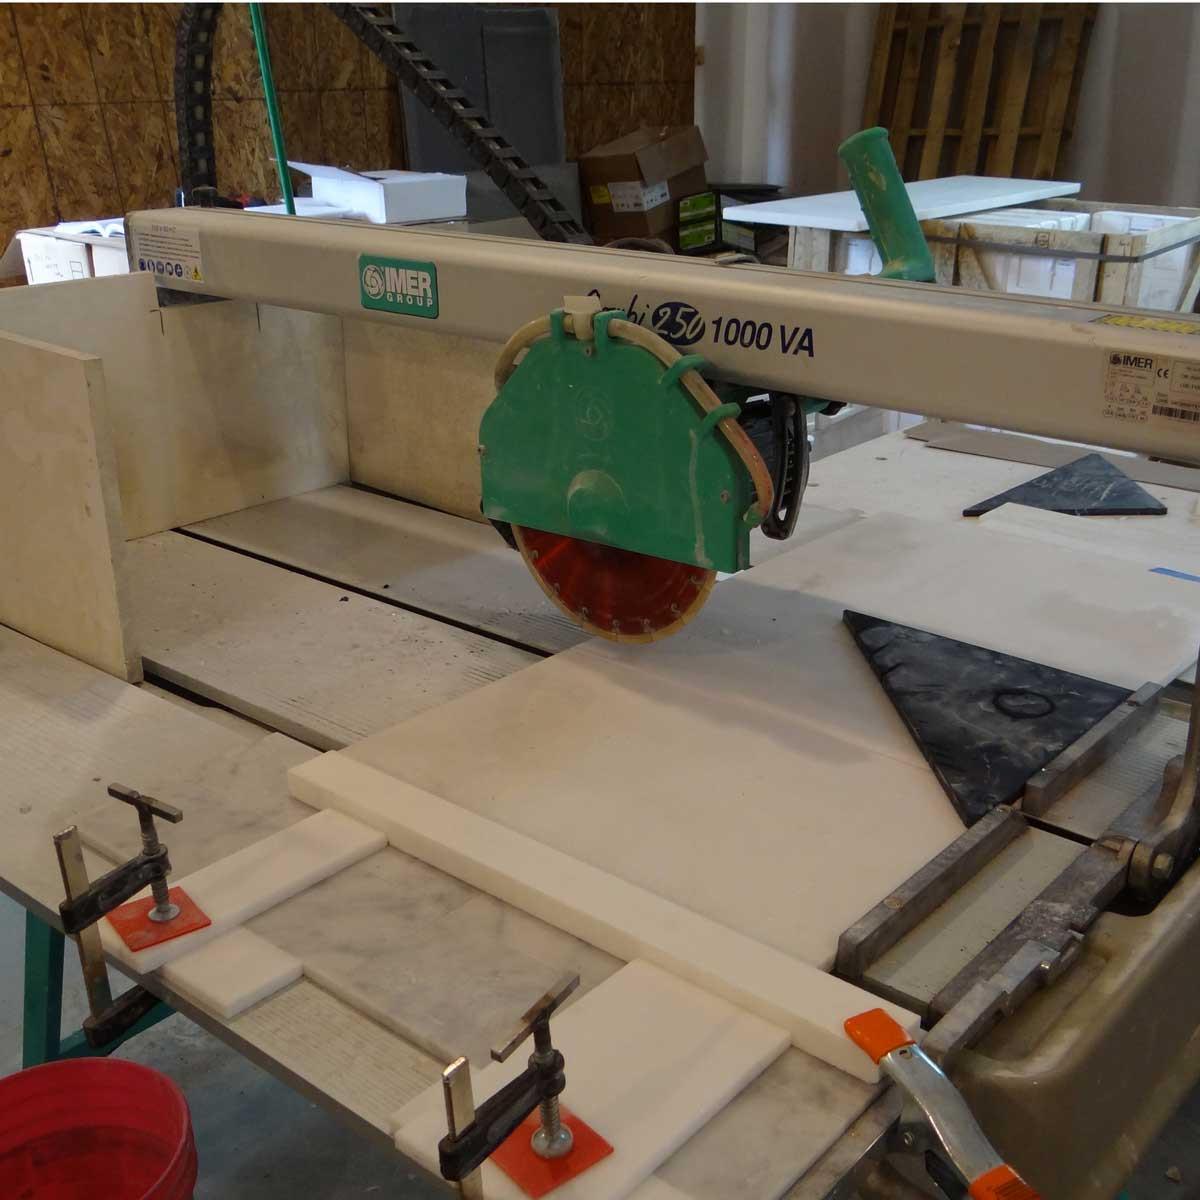 Imer Combi 250/1000VA wet tile saw cutting diagonal